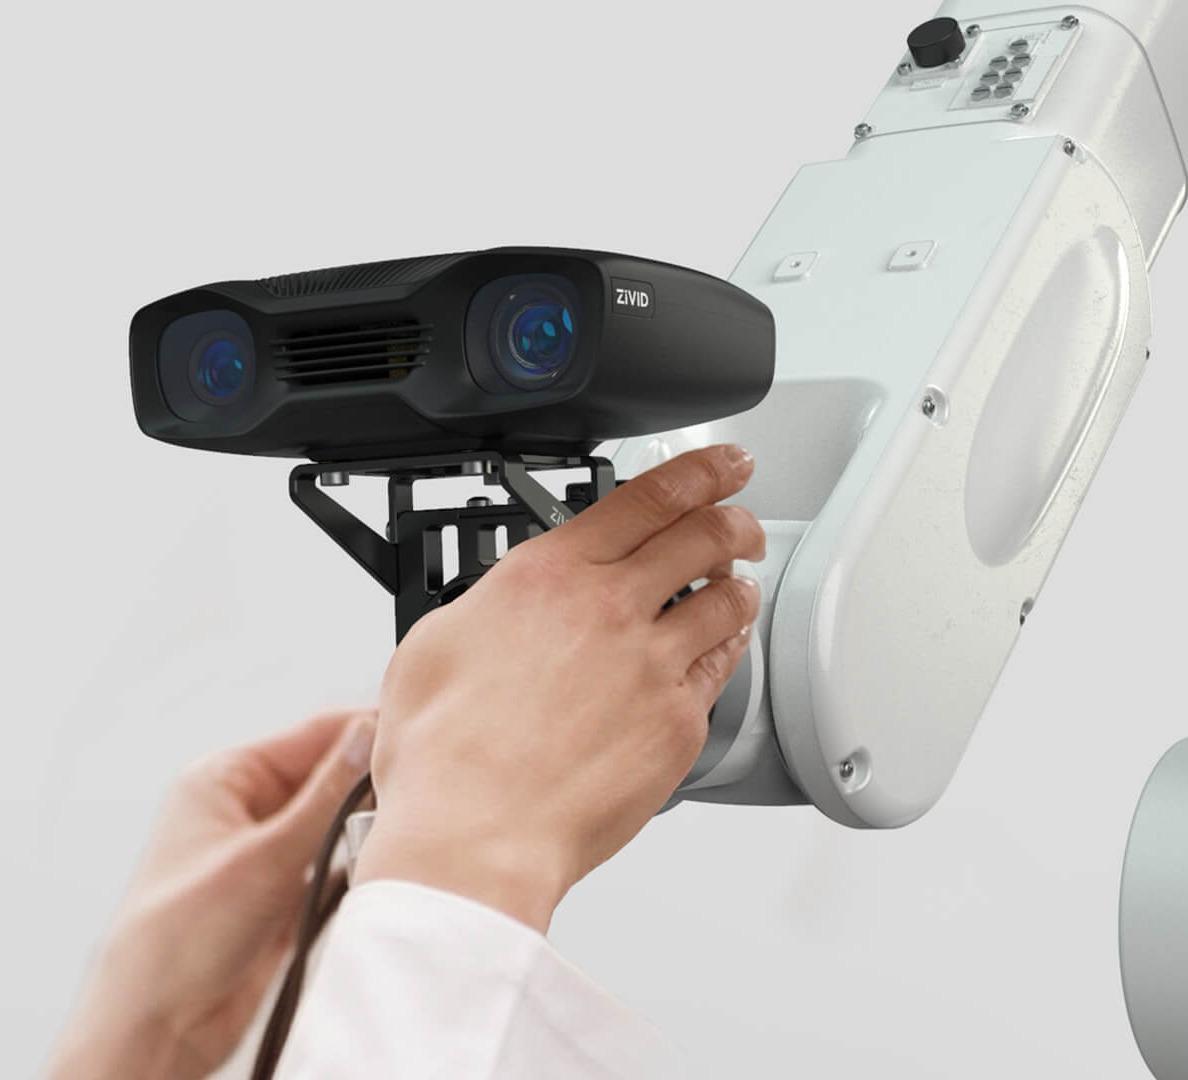 Zivid-Two-on-arm-robotics-3D-vision-color-camera